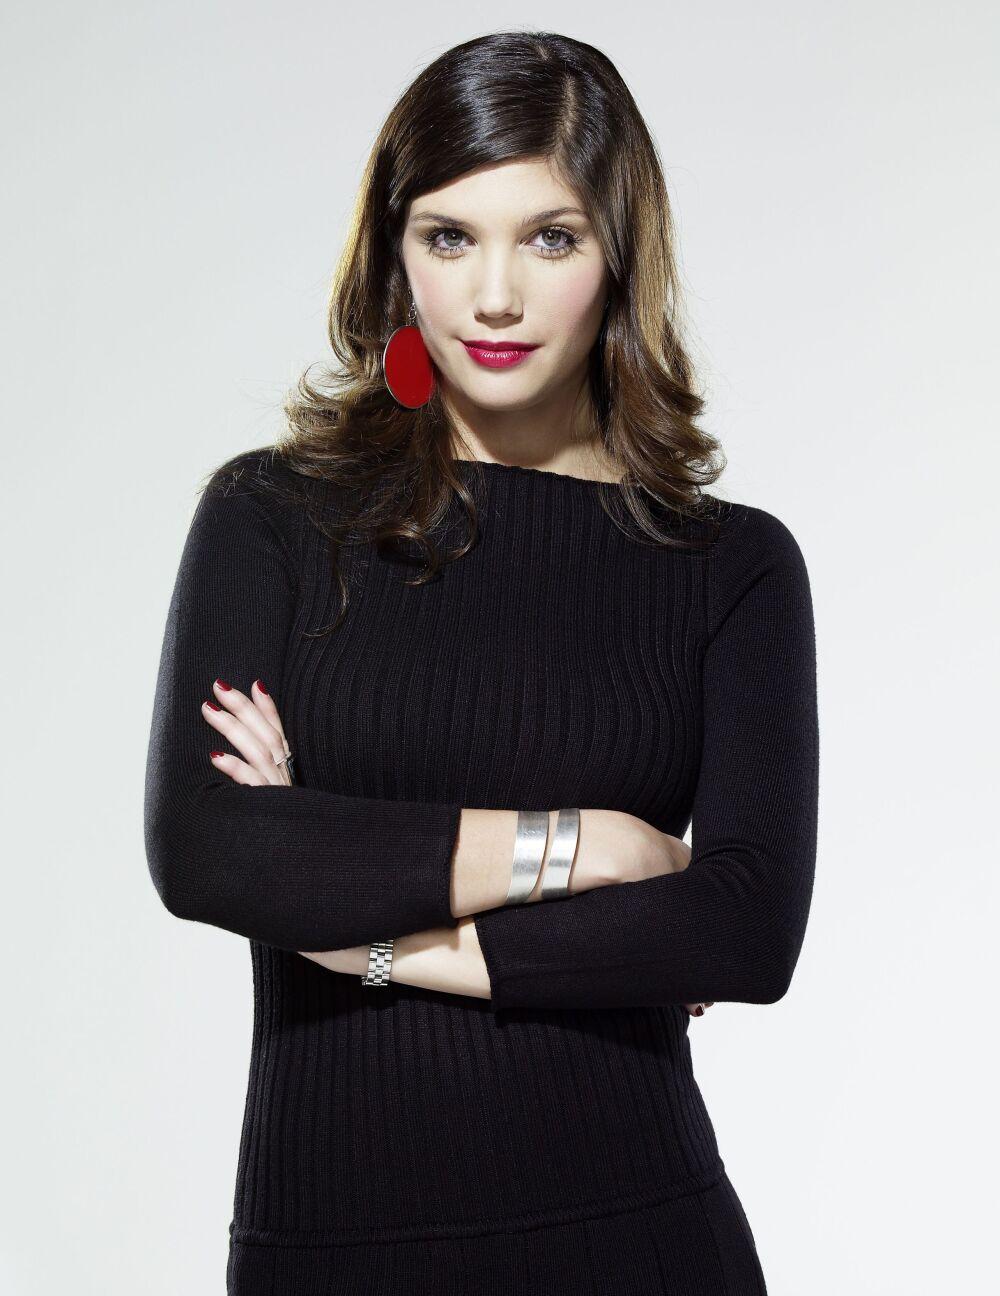 Fernanda sanmiguel.jpeg